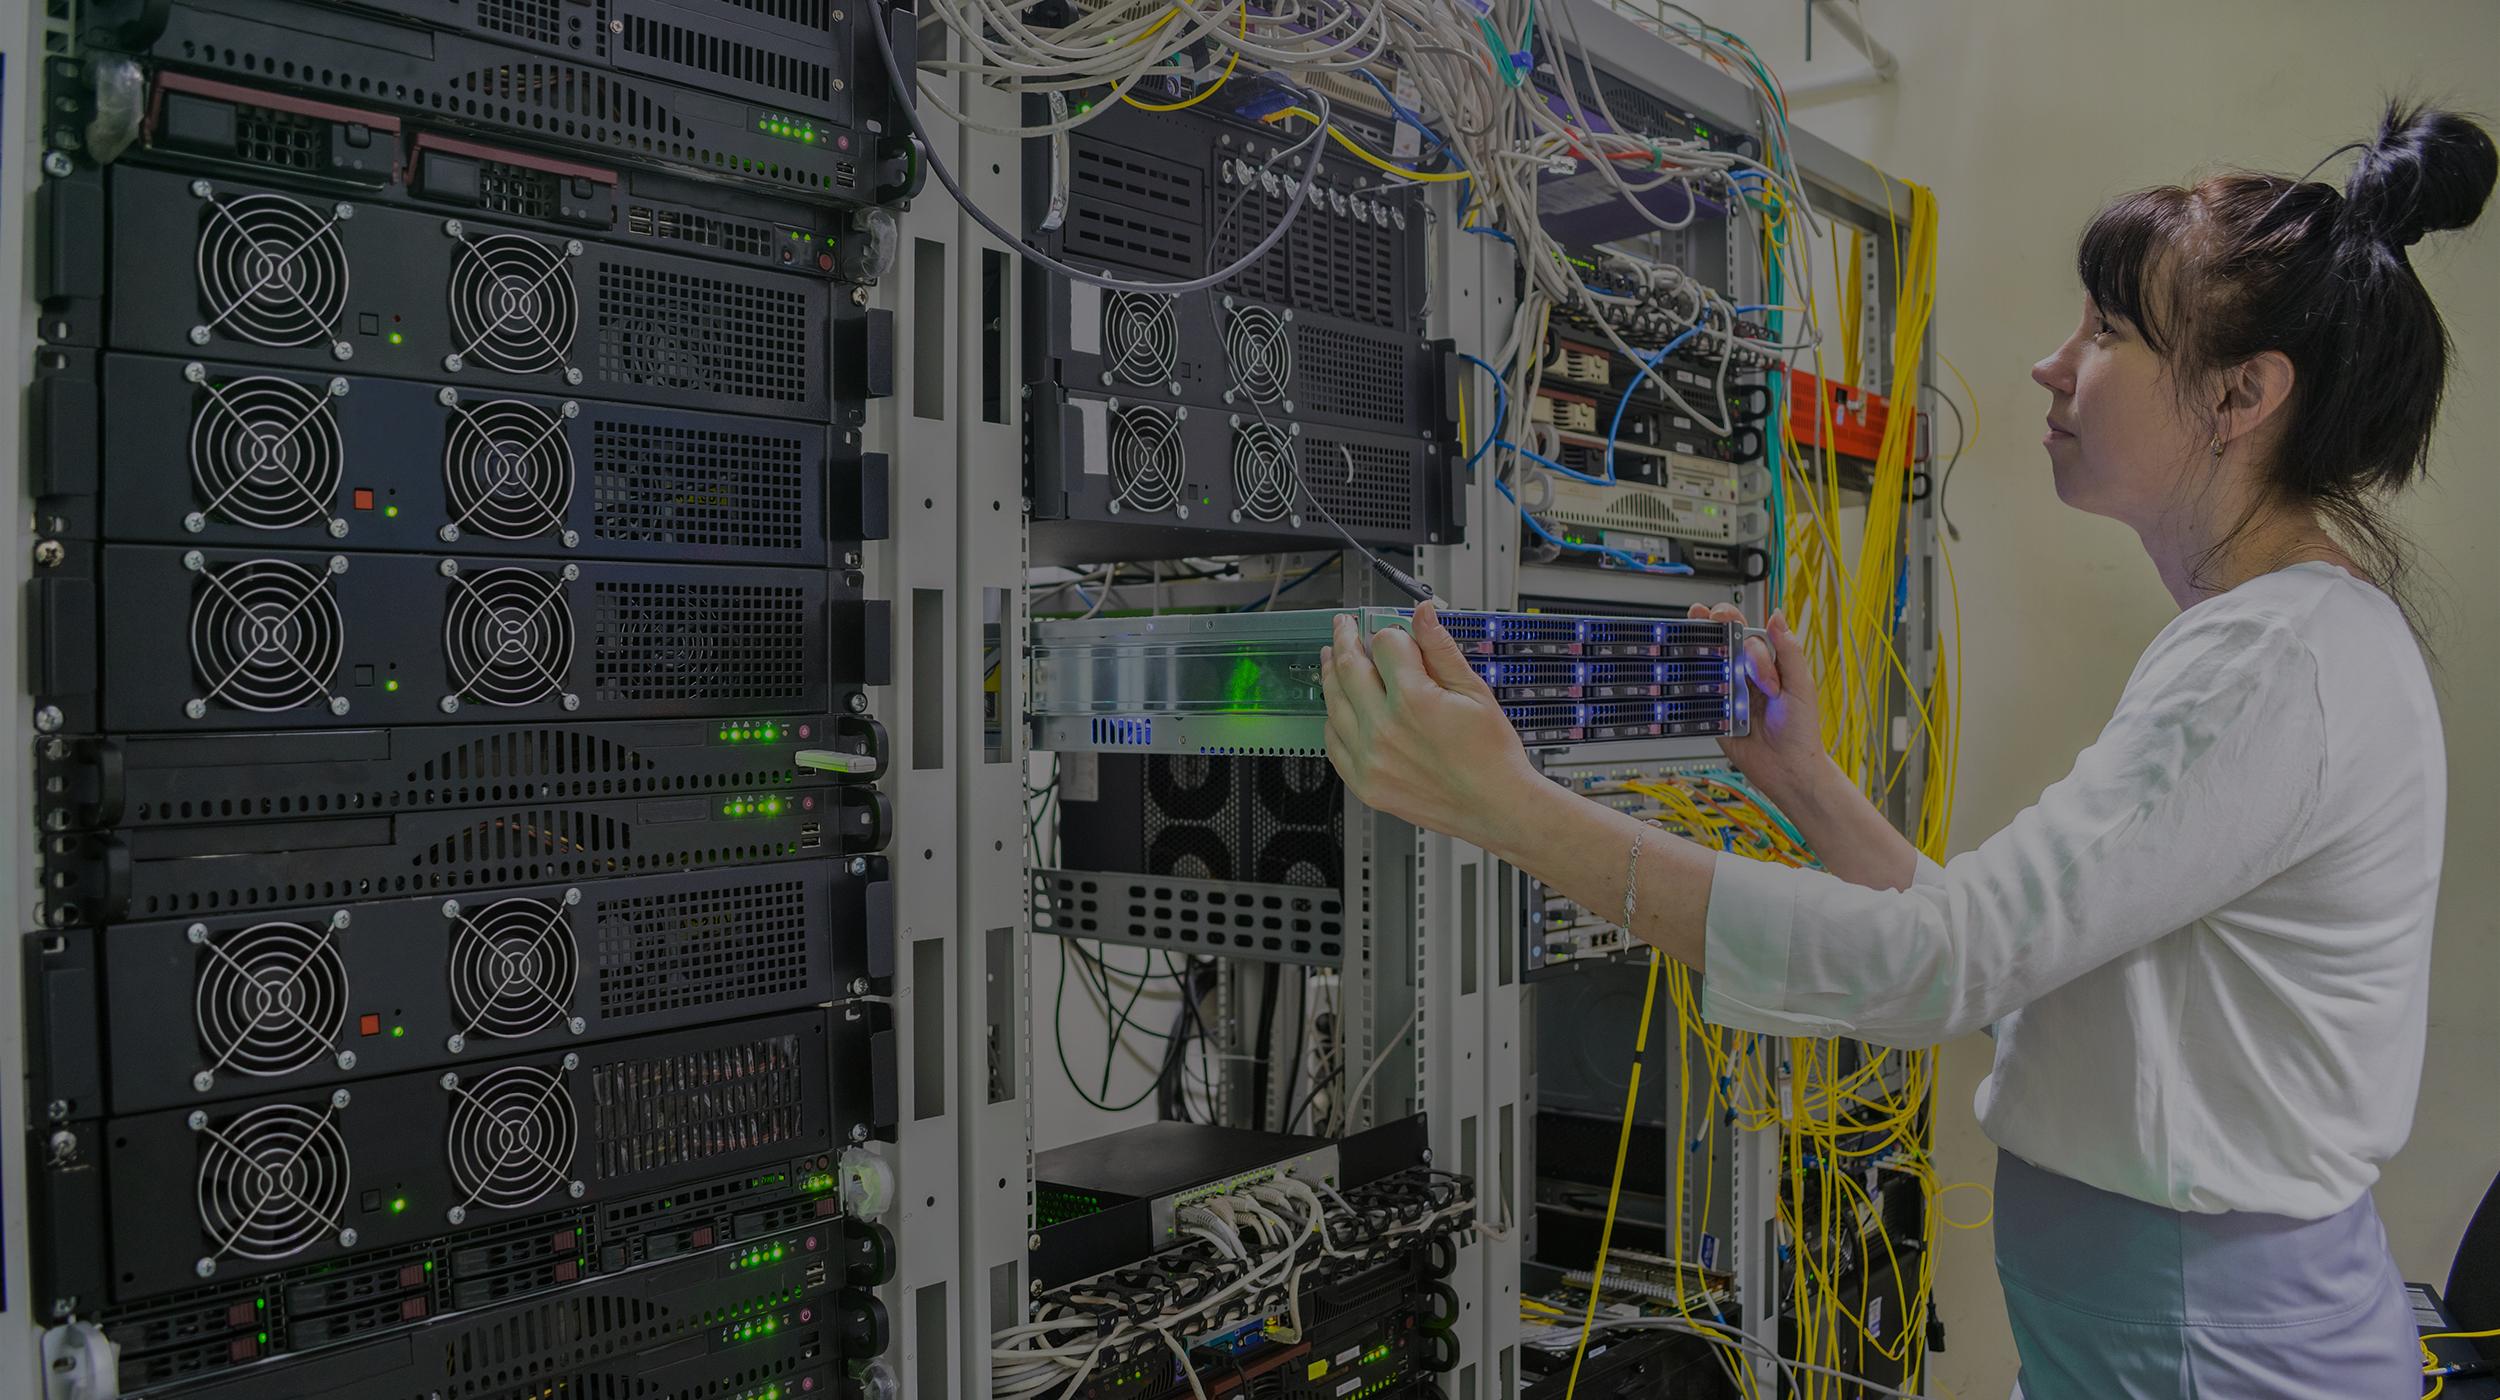 A woman installs a new server in a modern data center